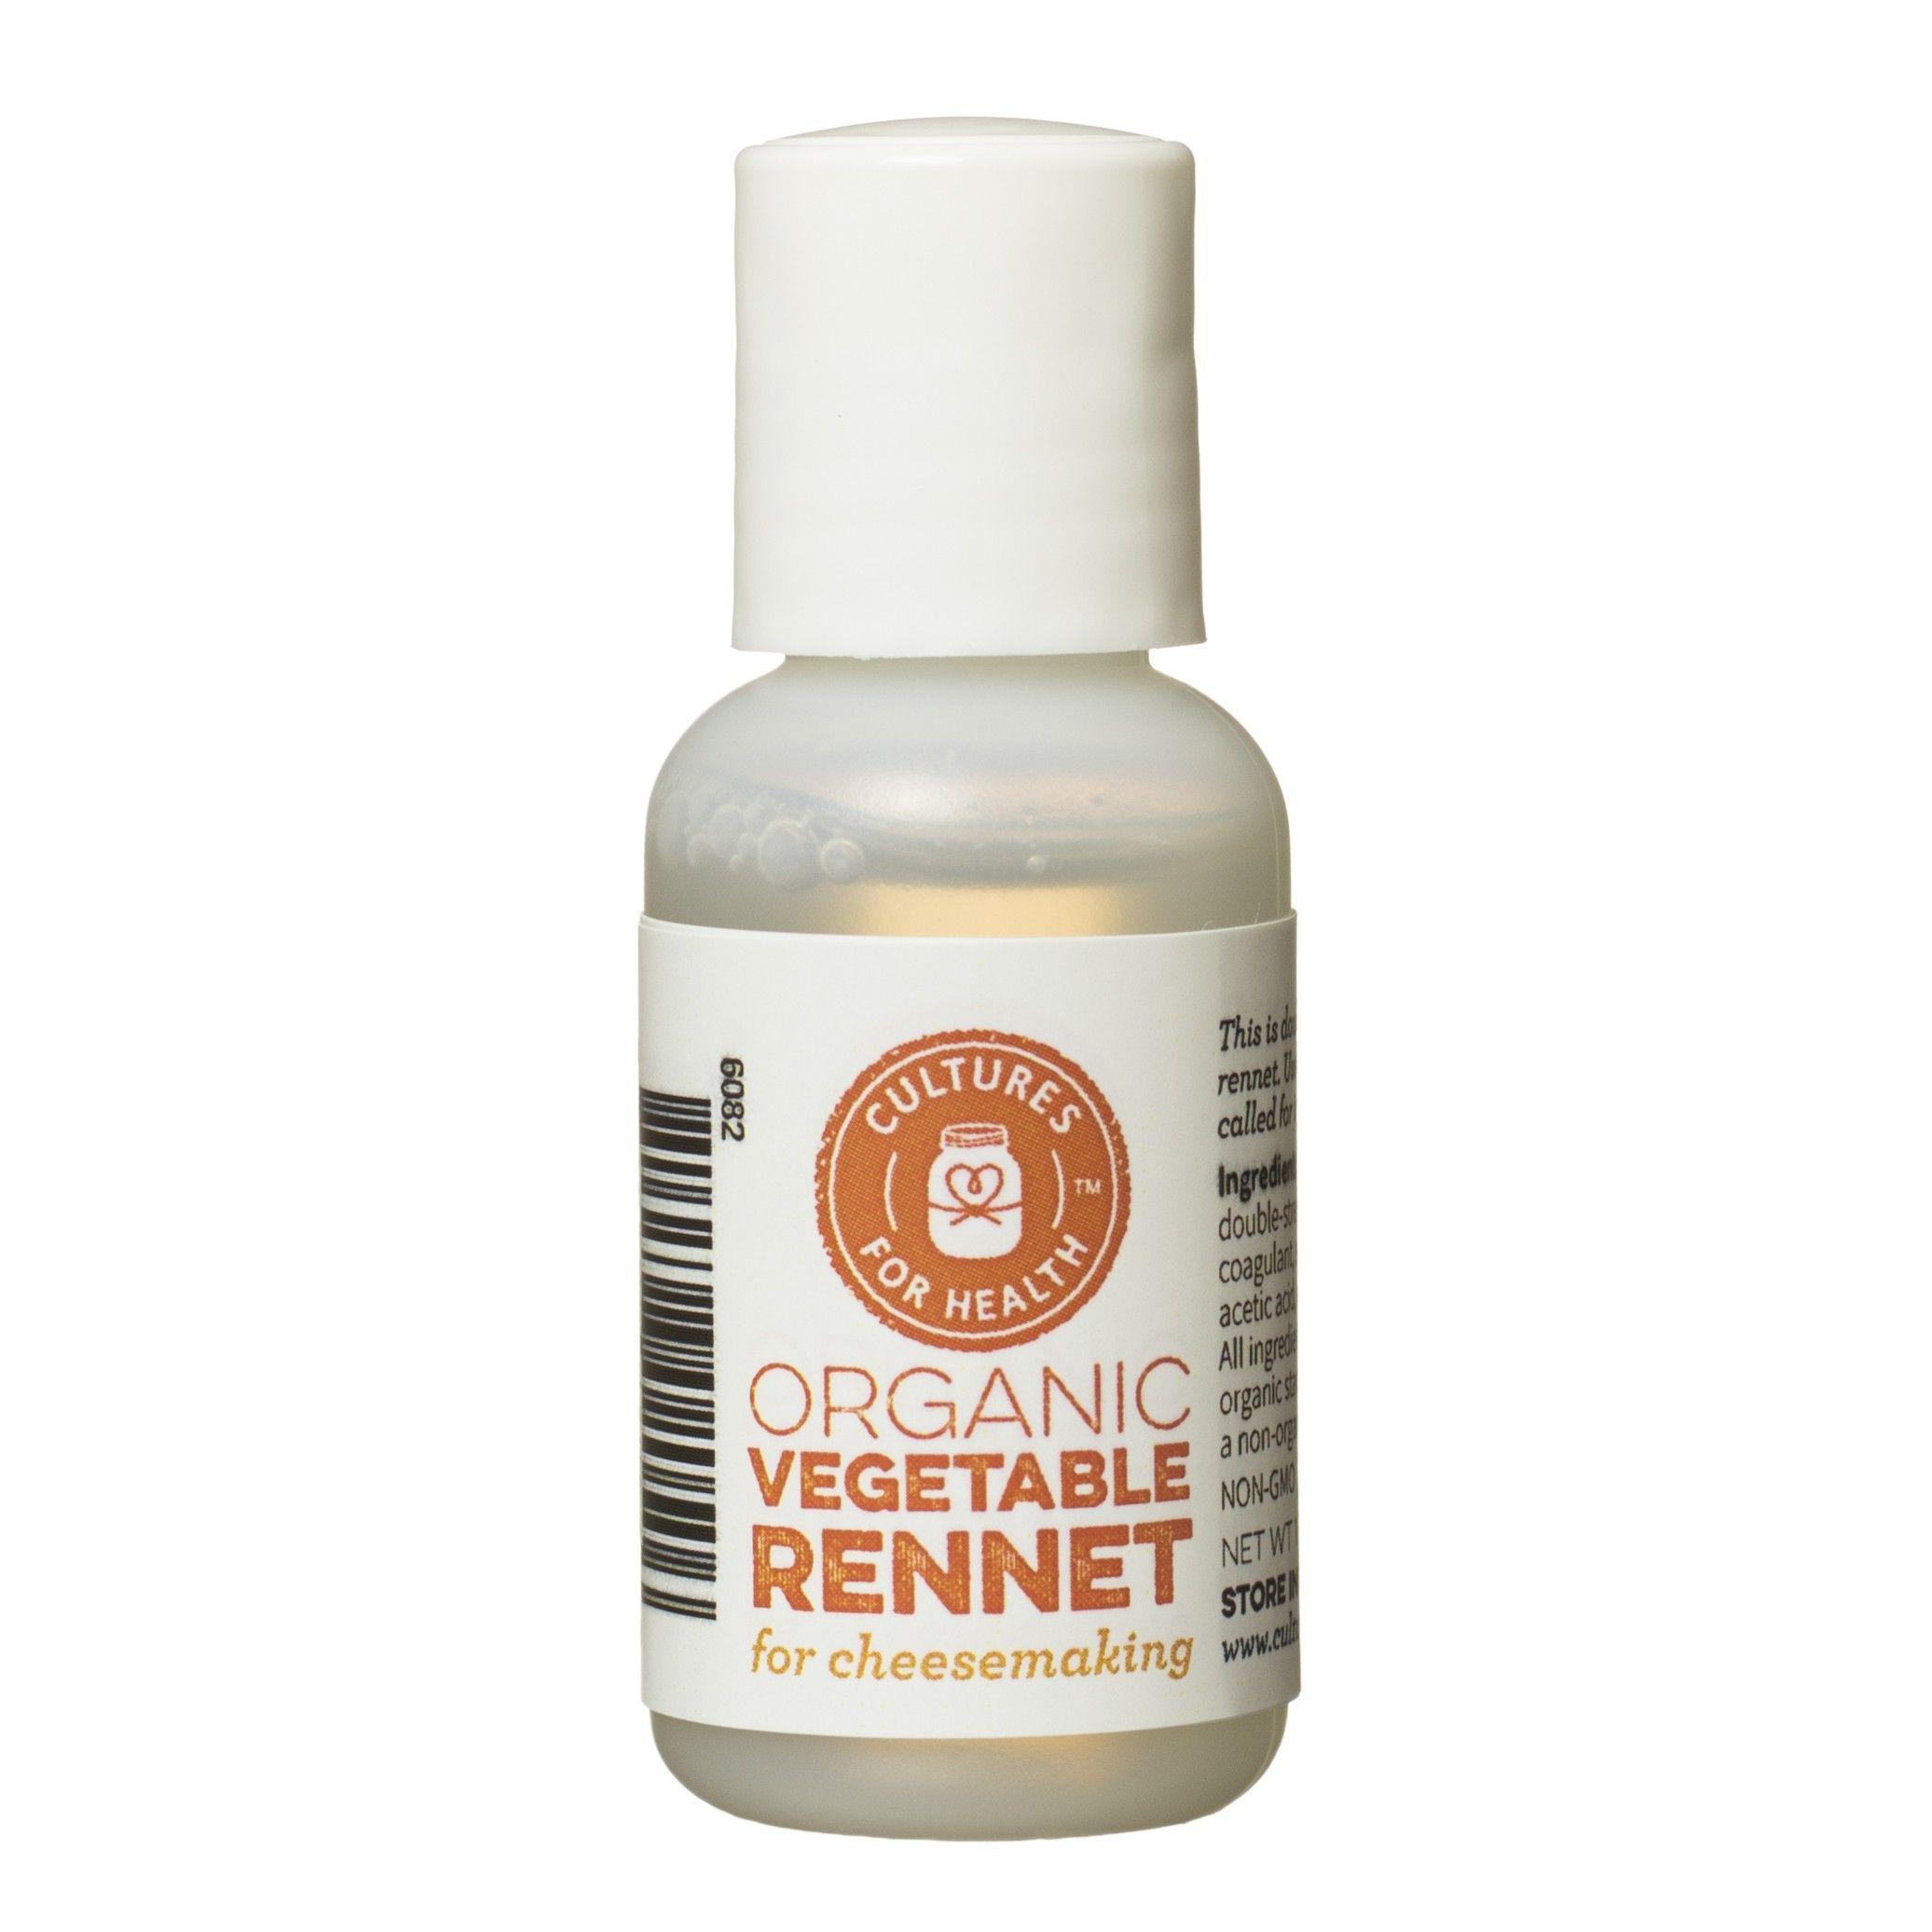 organic vegetable rennet | vegetable rennet, benefits of